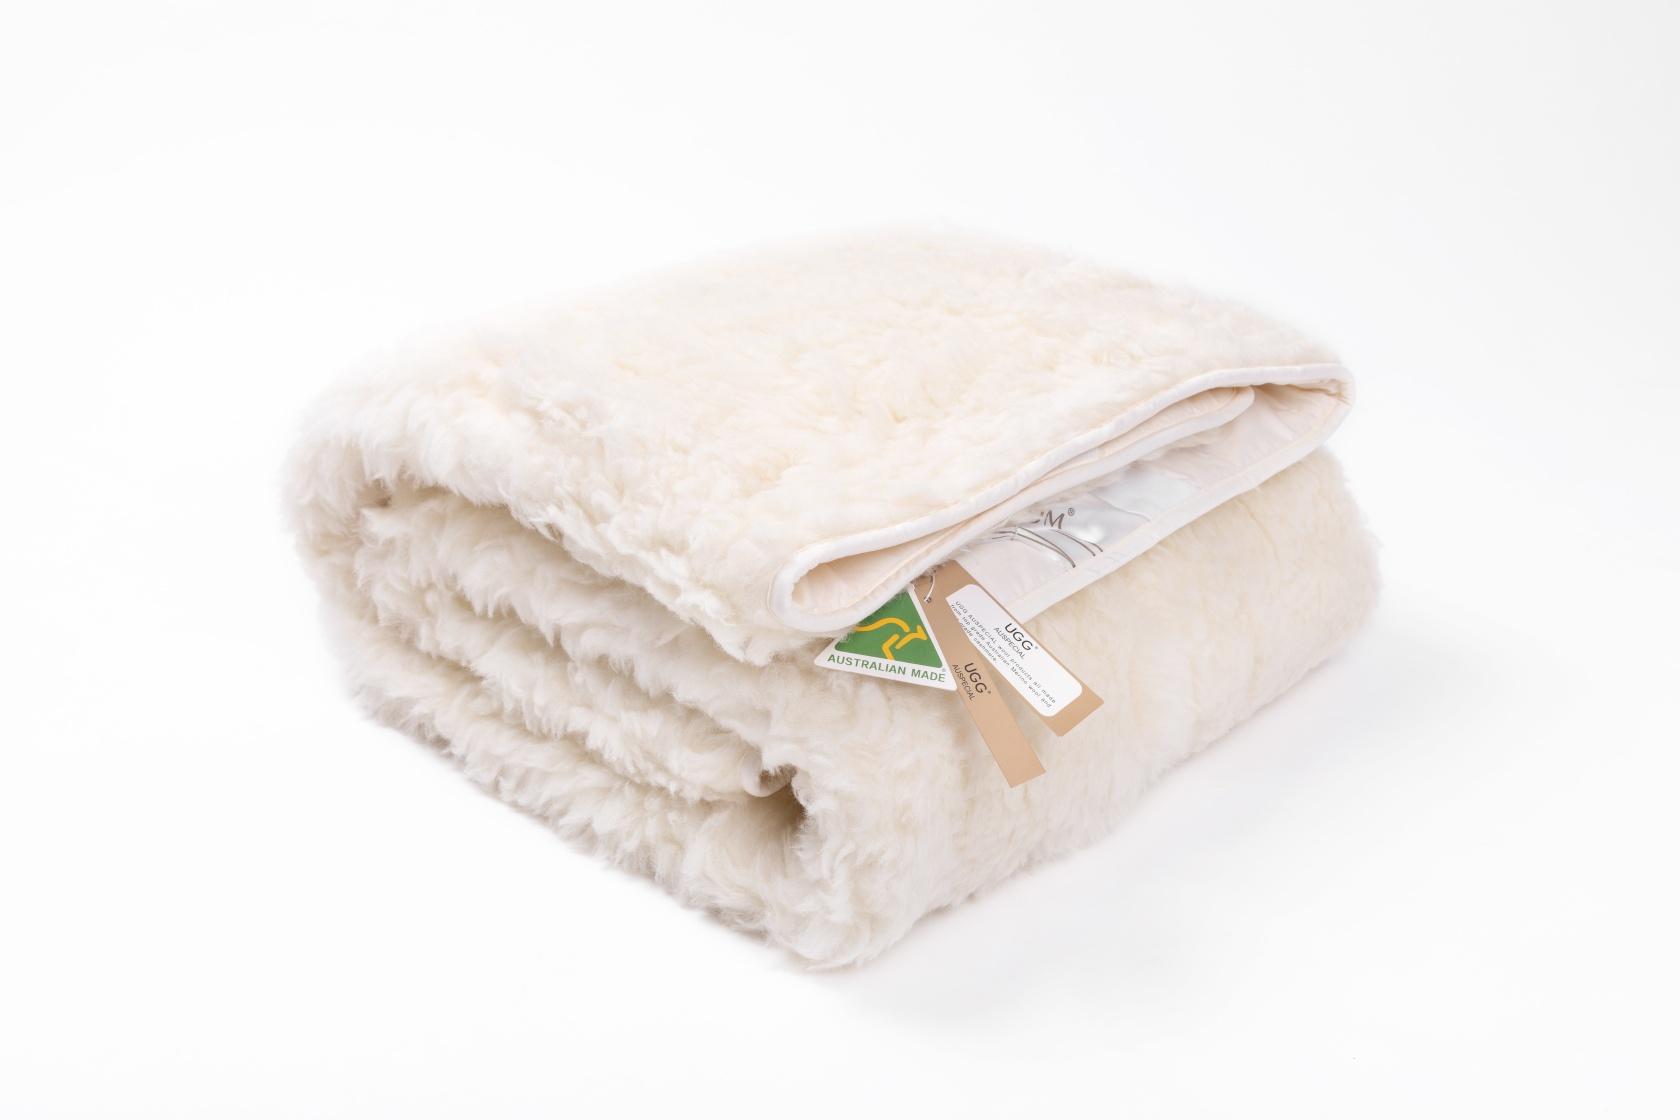 N43047羊毛褥子 180*200 100%澳产羊毛褥子